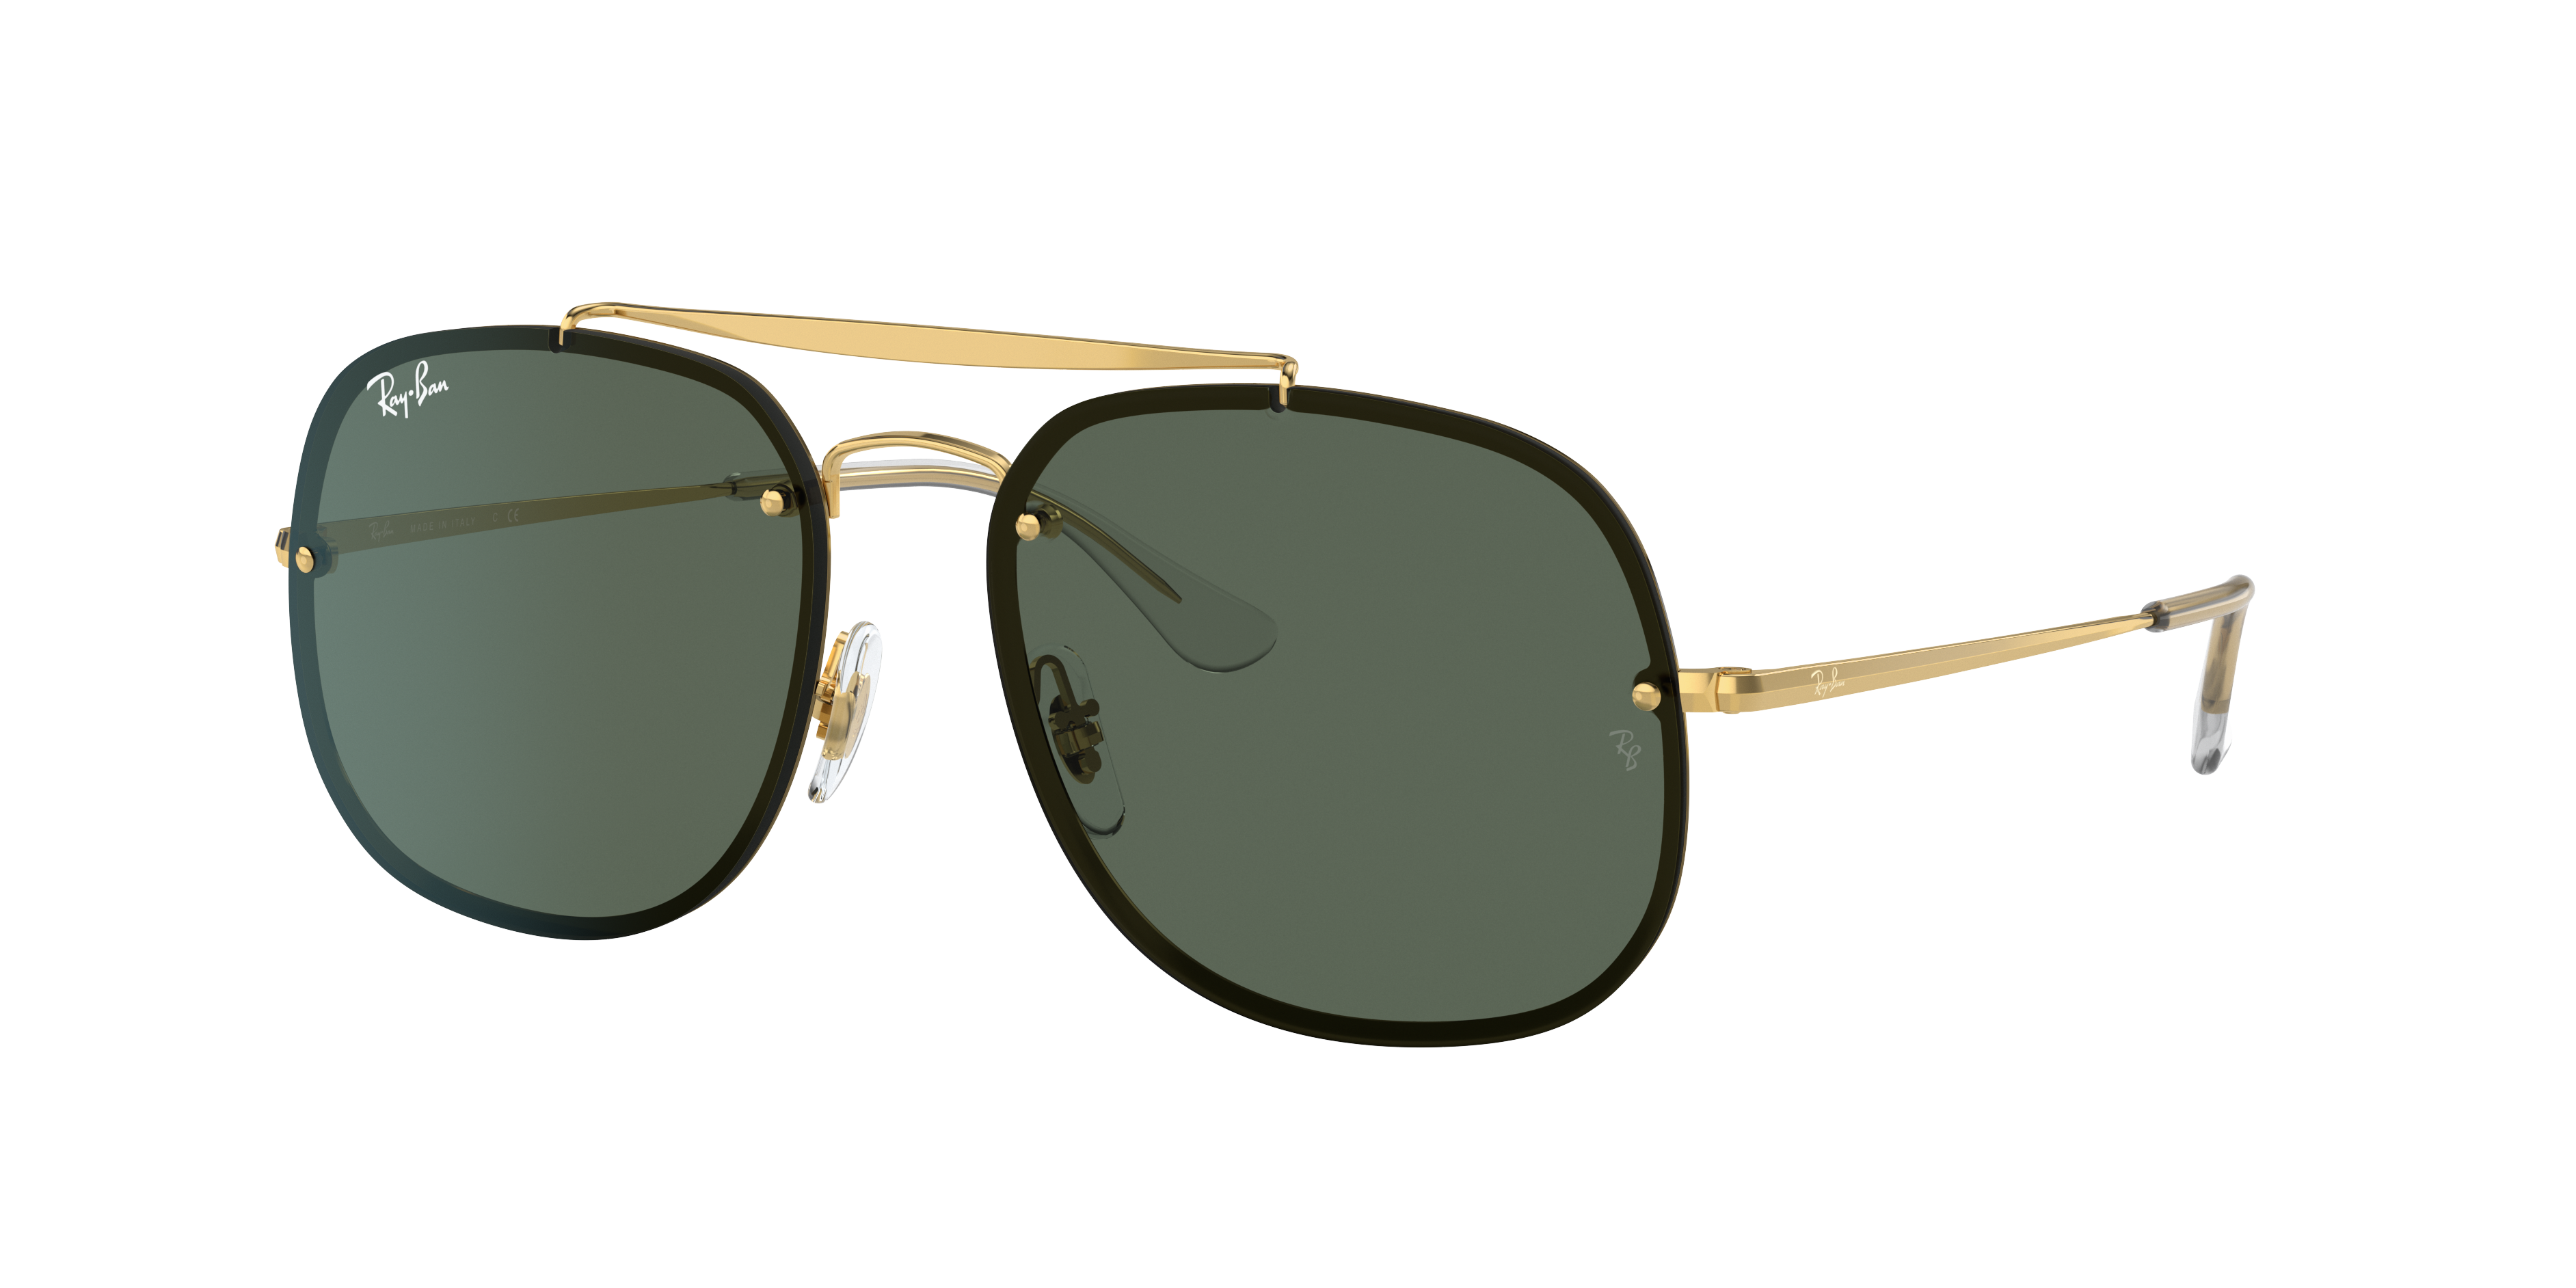 Ray-Ban Blaze General Gold, Green Lenses - RB3583N